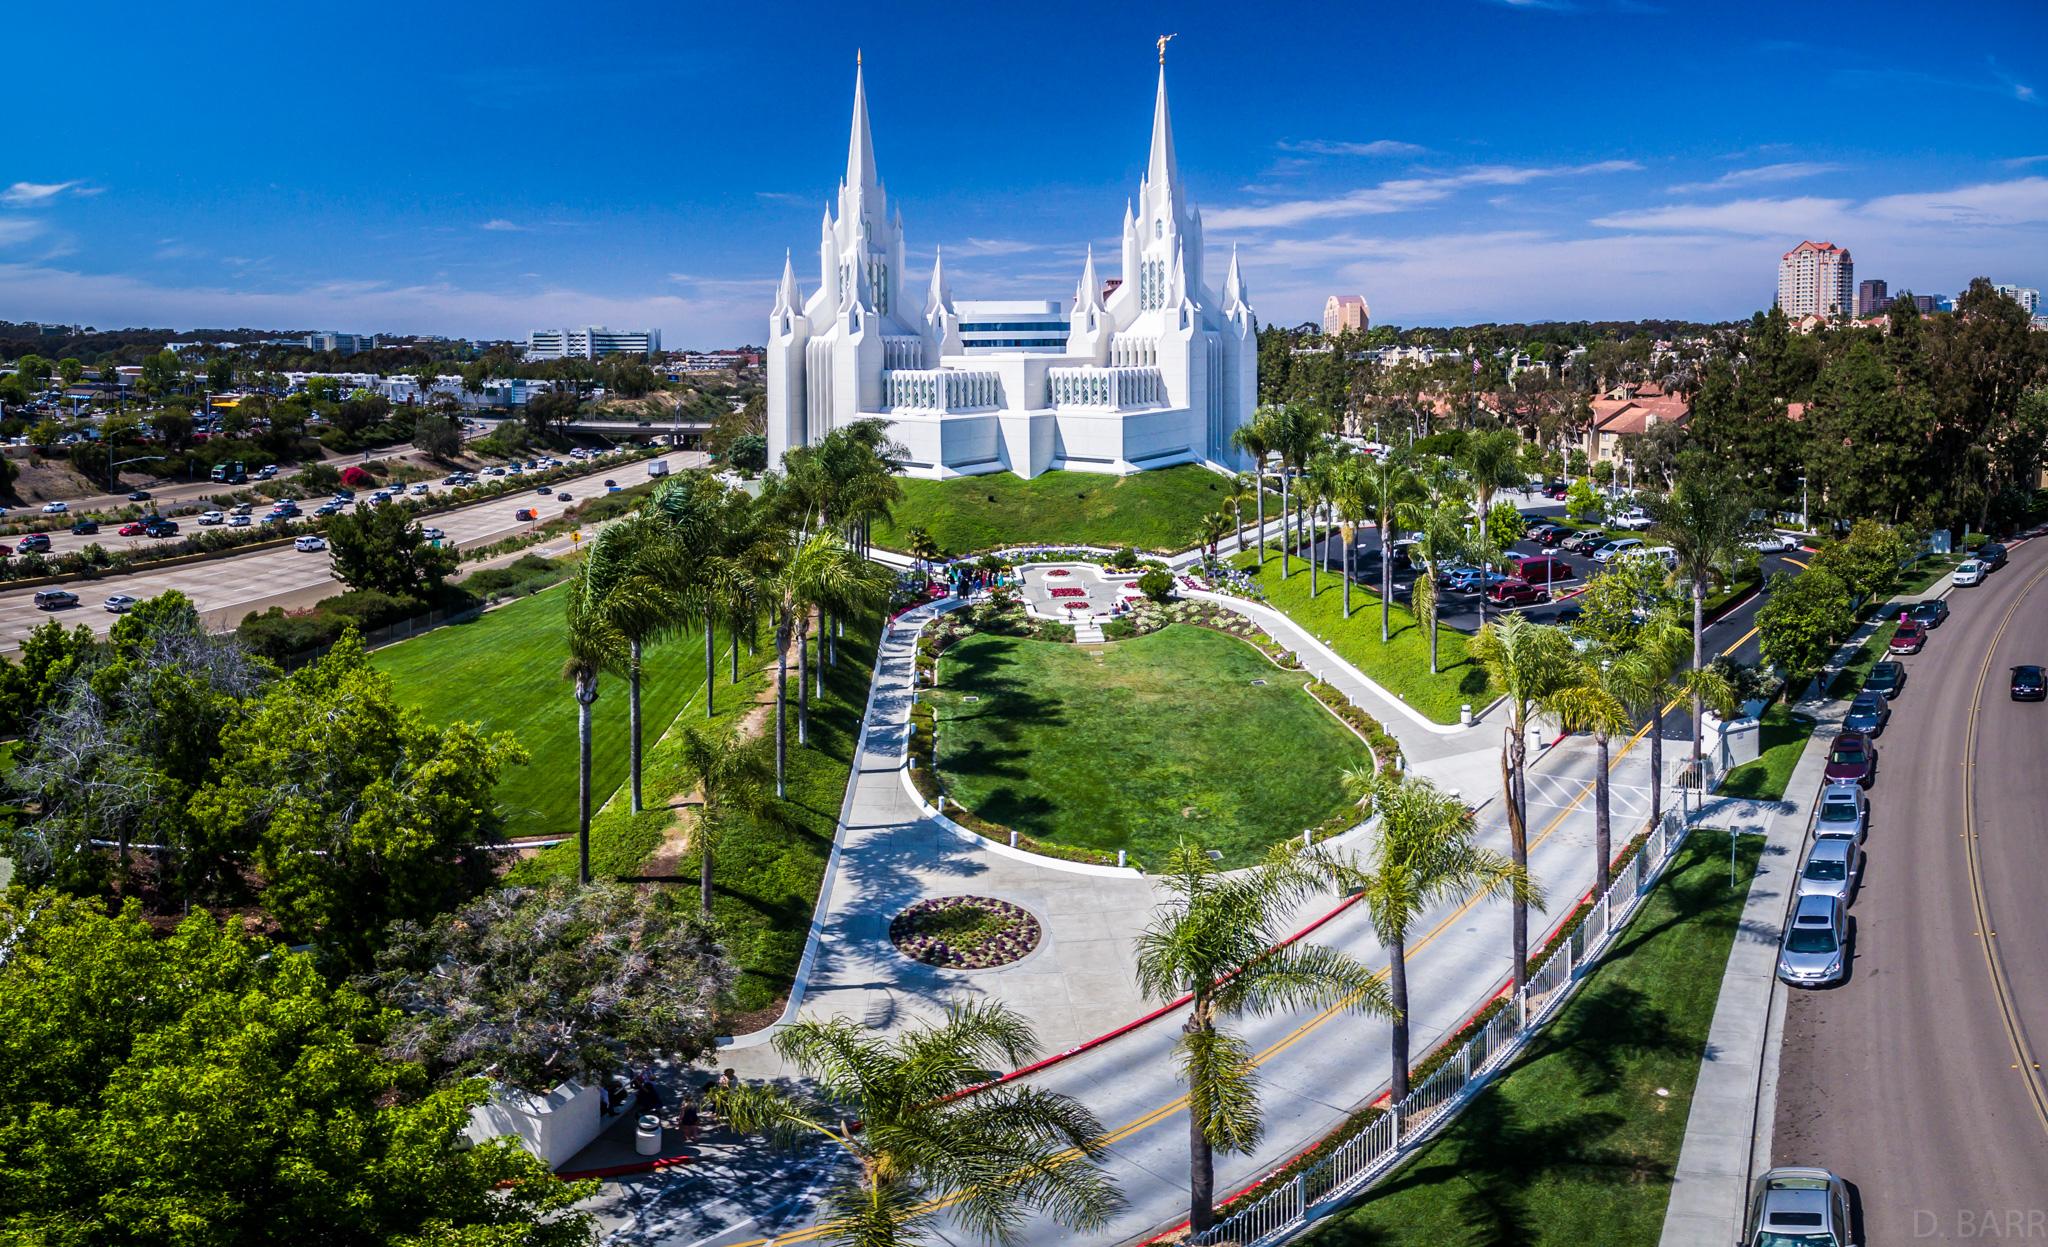 Mormon Temple (La Jolla, Ca.) Pano shot)